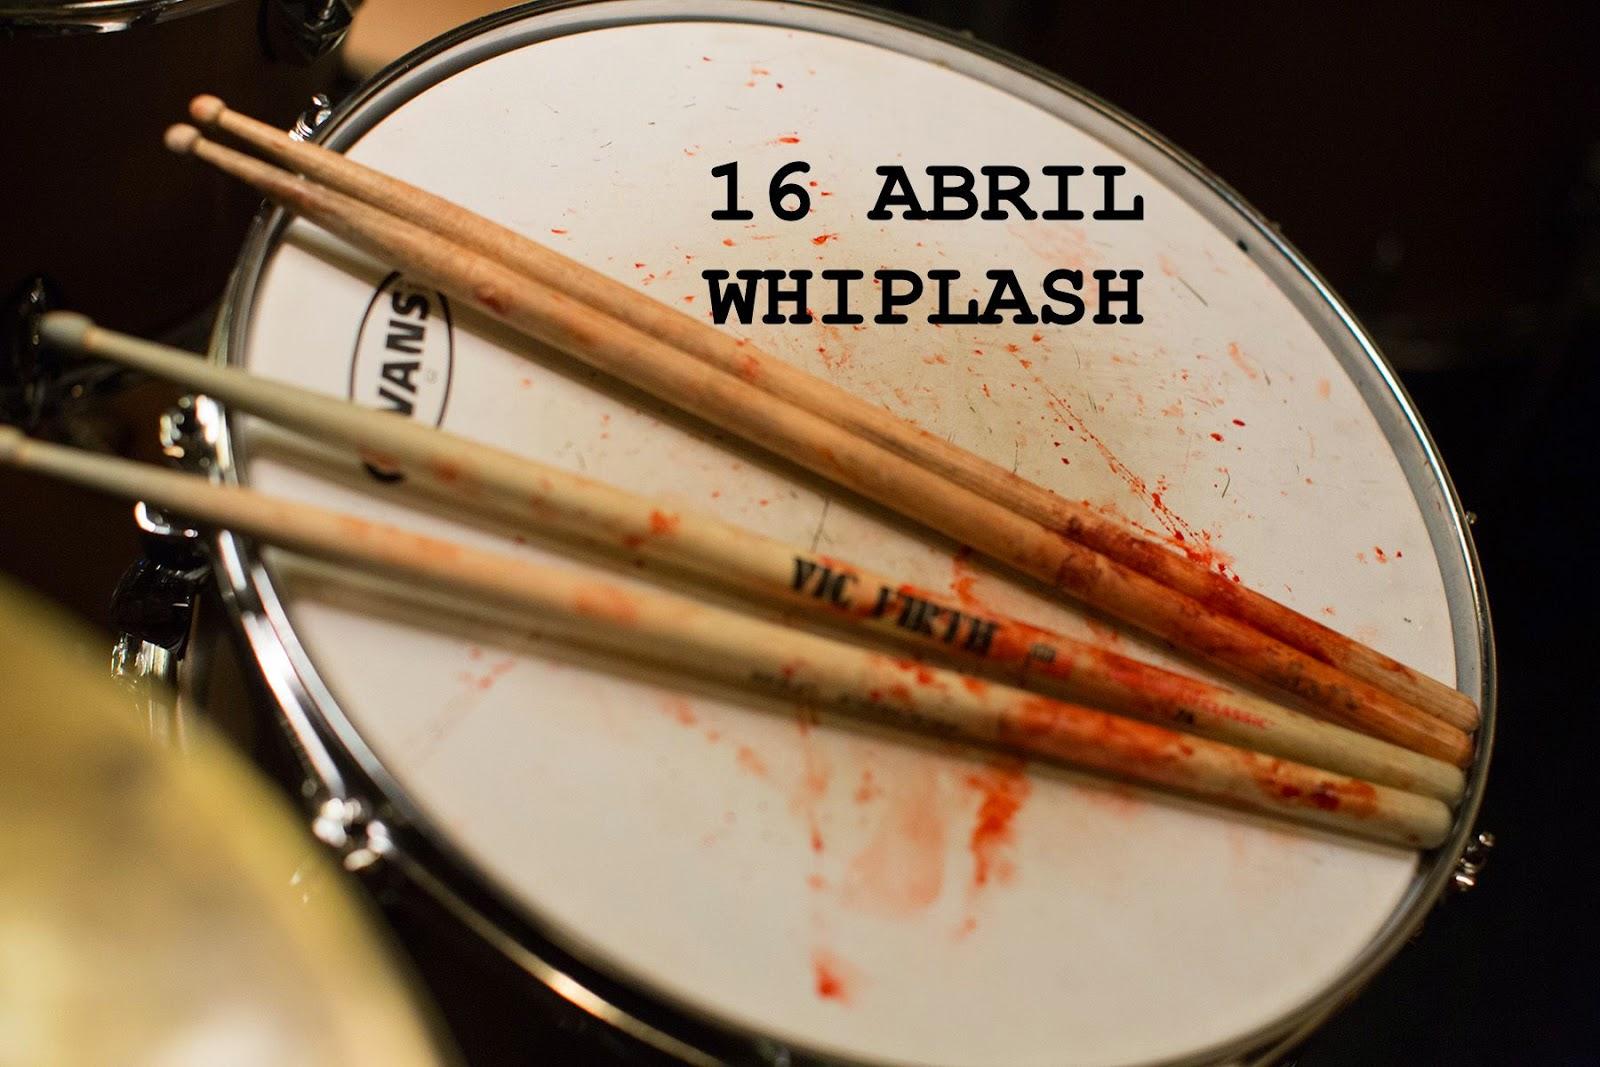 Whiplash - Nos Limites - Whiplash  de Damien Chazelle